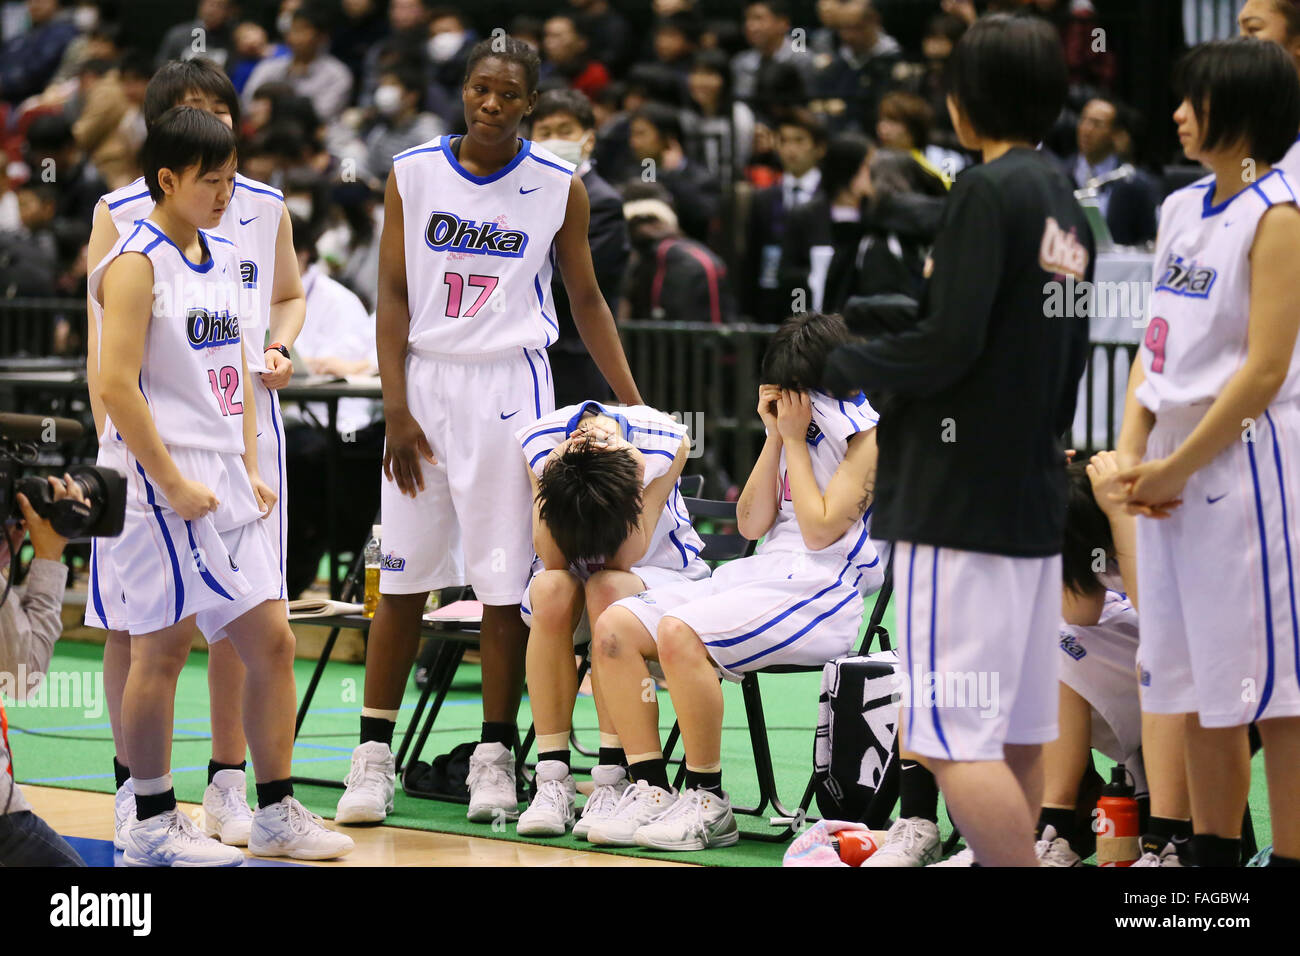 Tokyo Metropolitan Gymnasium, Tokyo, Japan. 28th Dec, 2015. Ohka gakuen team group, DECEMBER 28, 2015 - Basketball Stock Photo